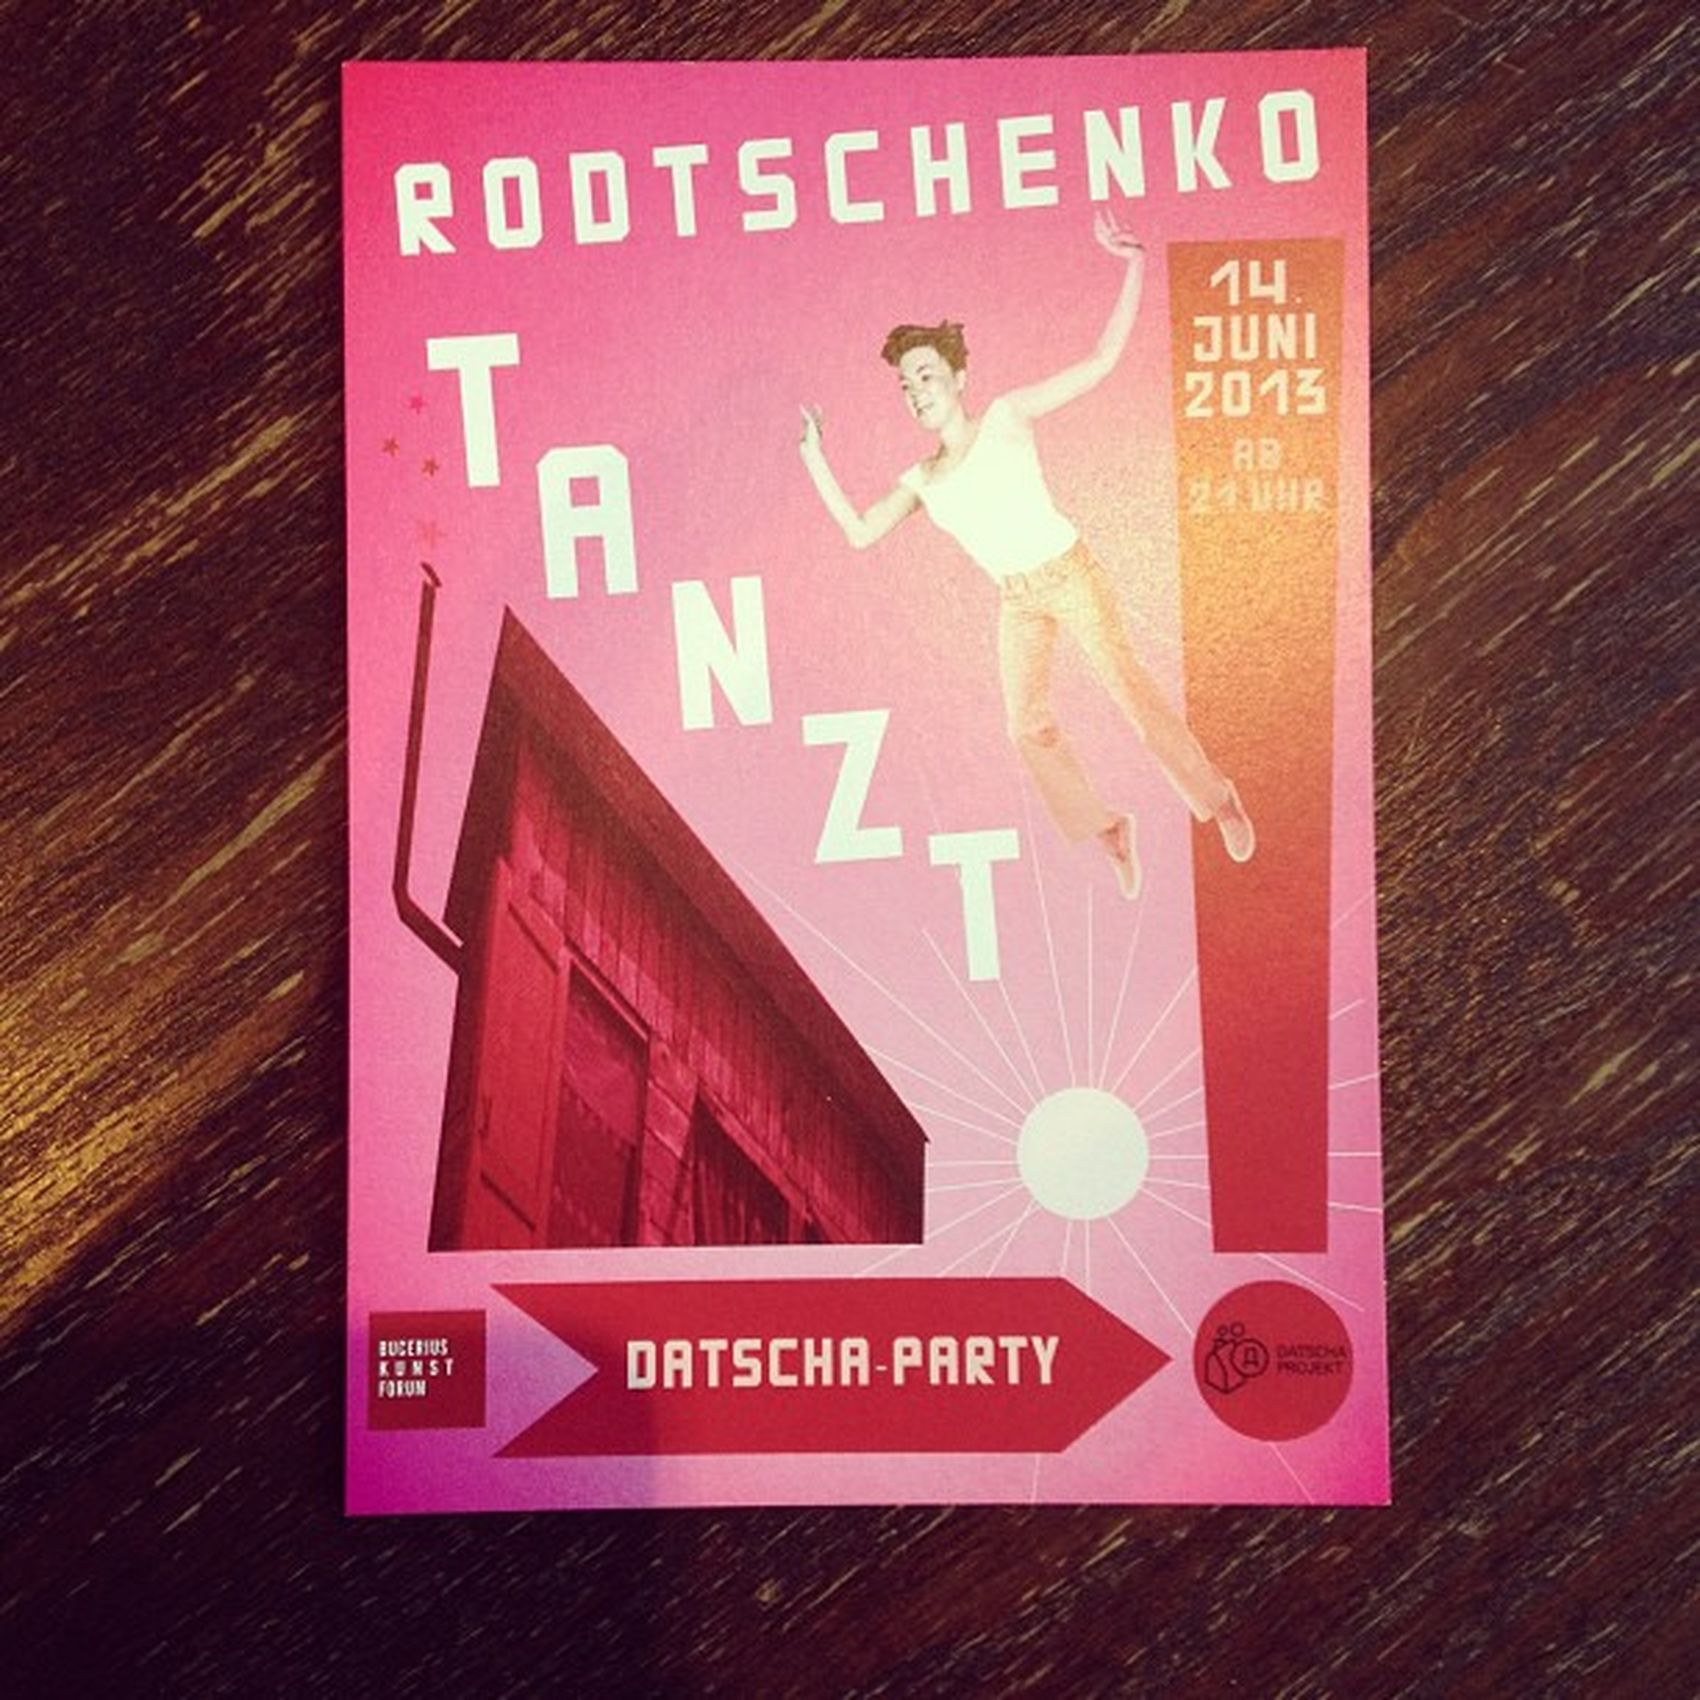 #Datscha-Party im #Bucerius! 14.06., 20h Datscha Bucerius